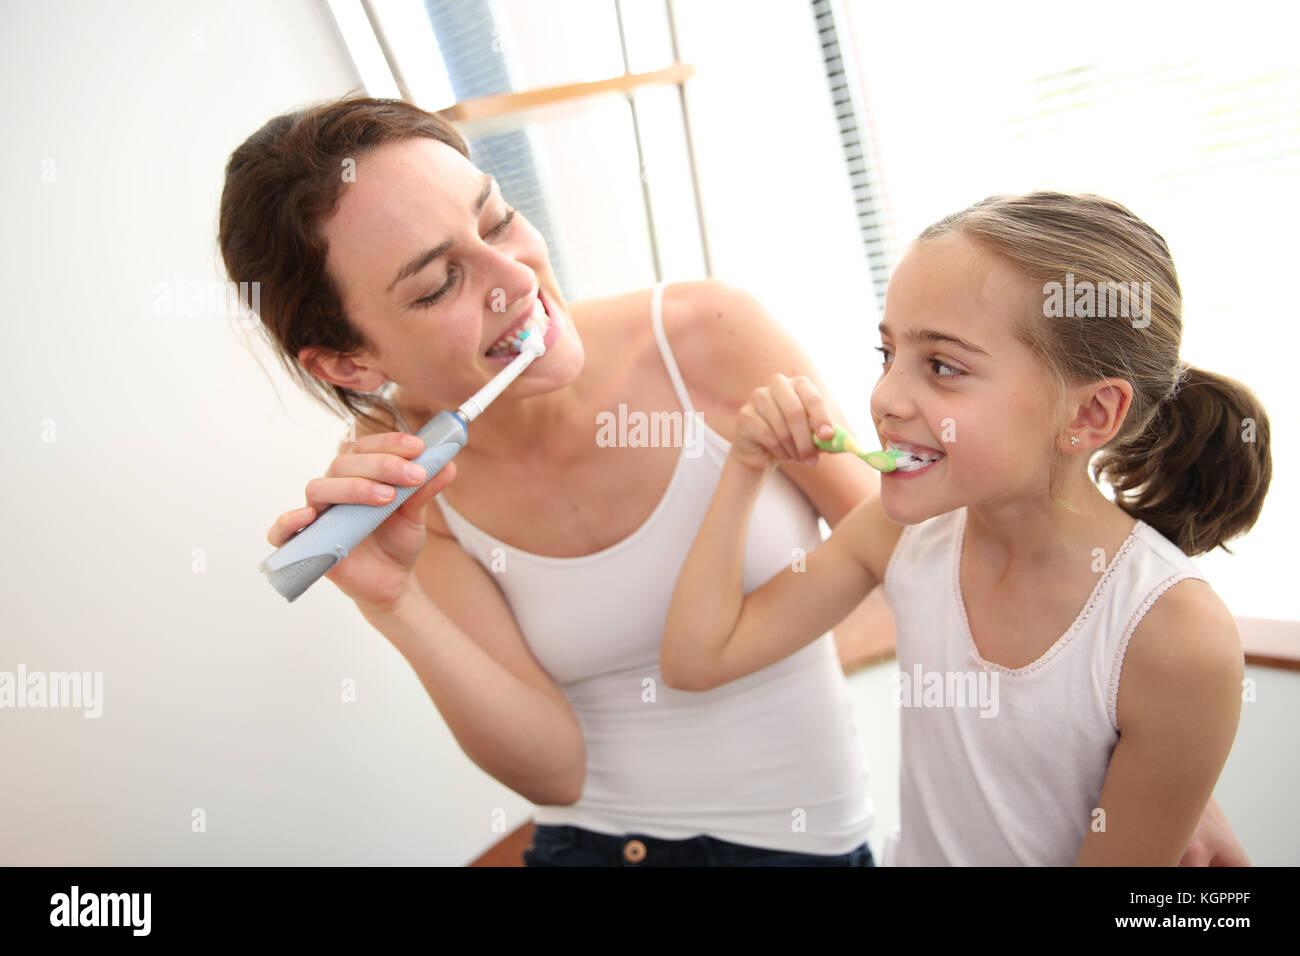 Mother teaching little girl how to brush her teeth - Stock Image